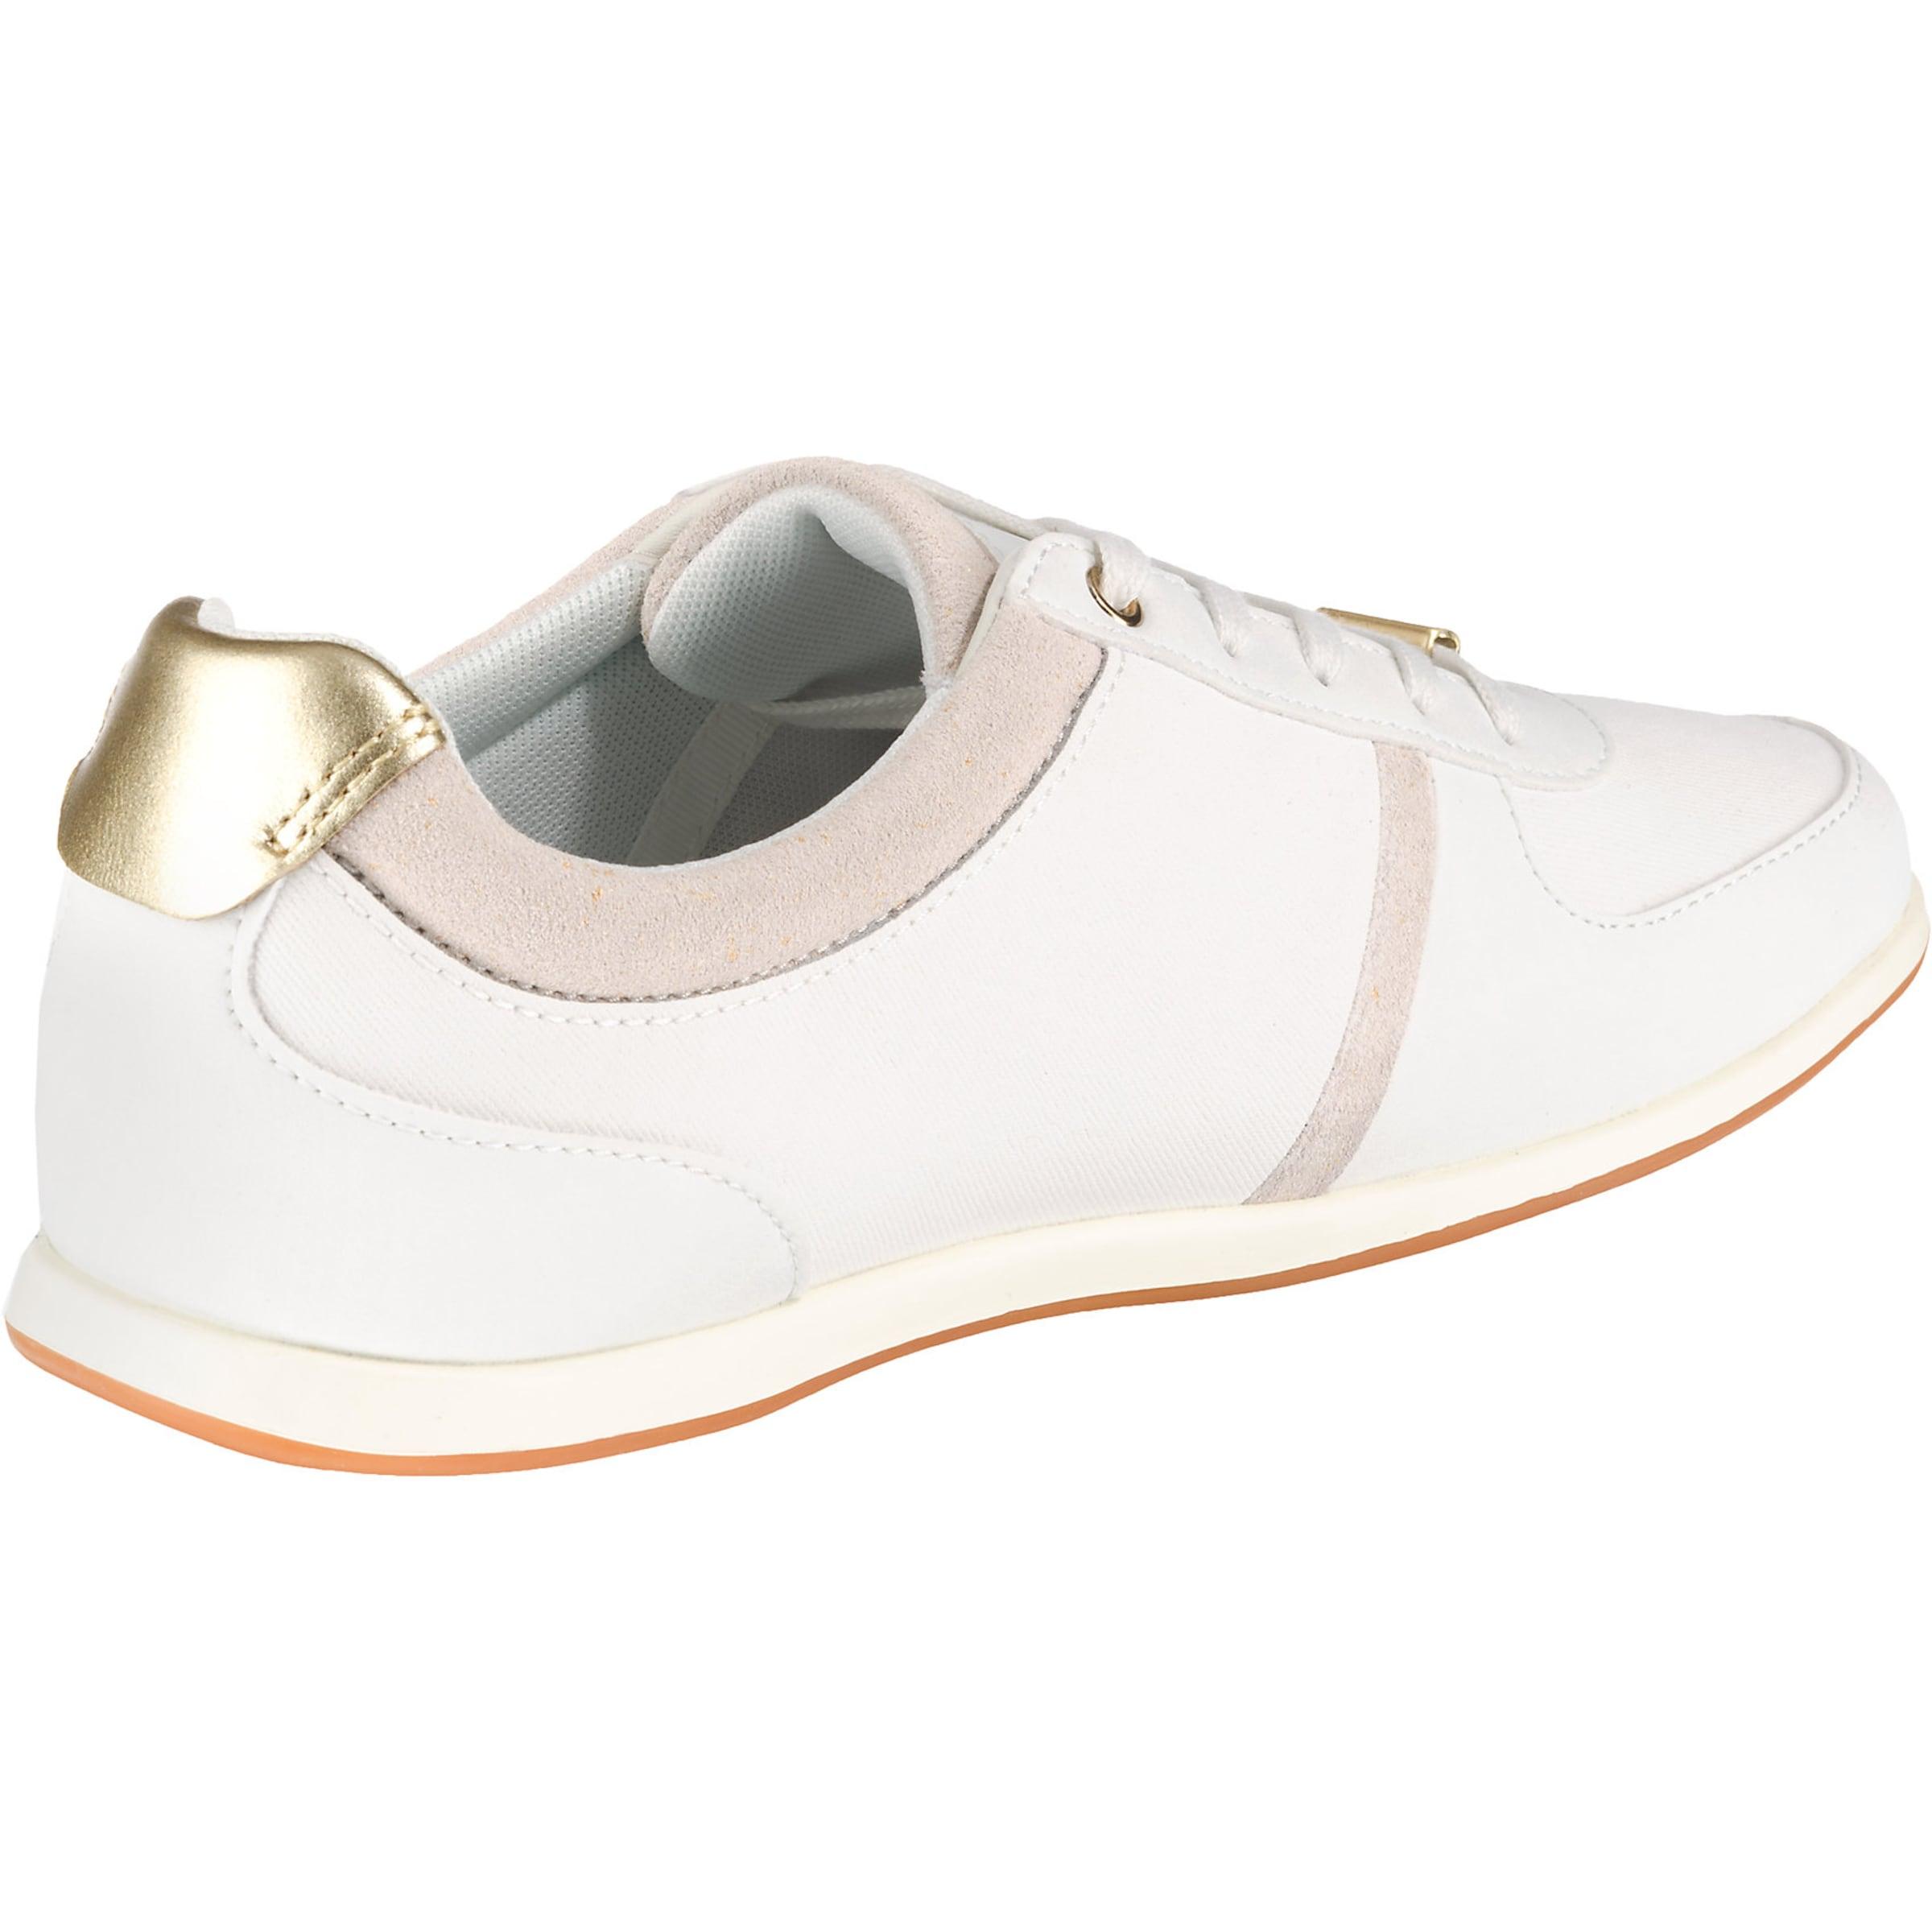 AltrosaWeiß Lacoste Lacoste AltrosaWeiß Sneaker Sneaker In Lacoste In AltrosaWeiß In Sneaker HIE9WD2